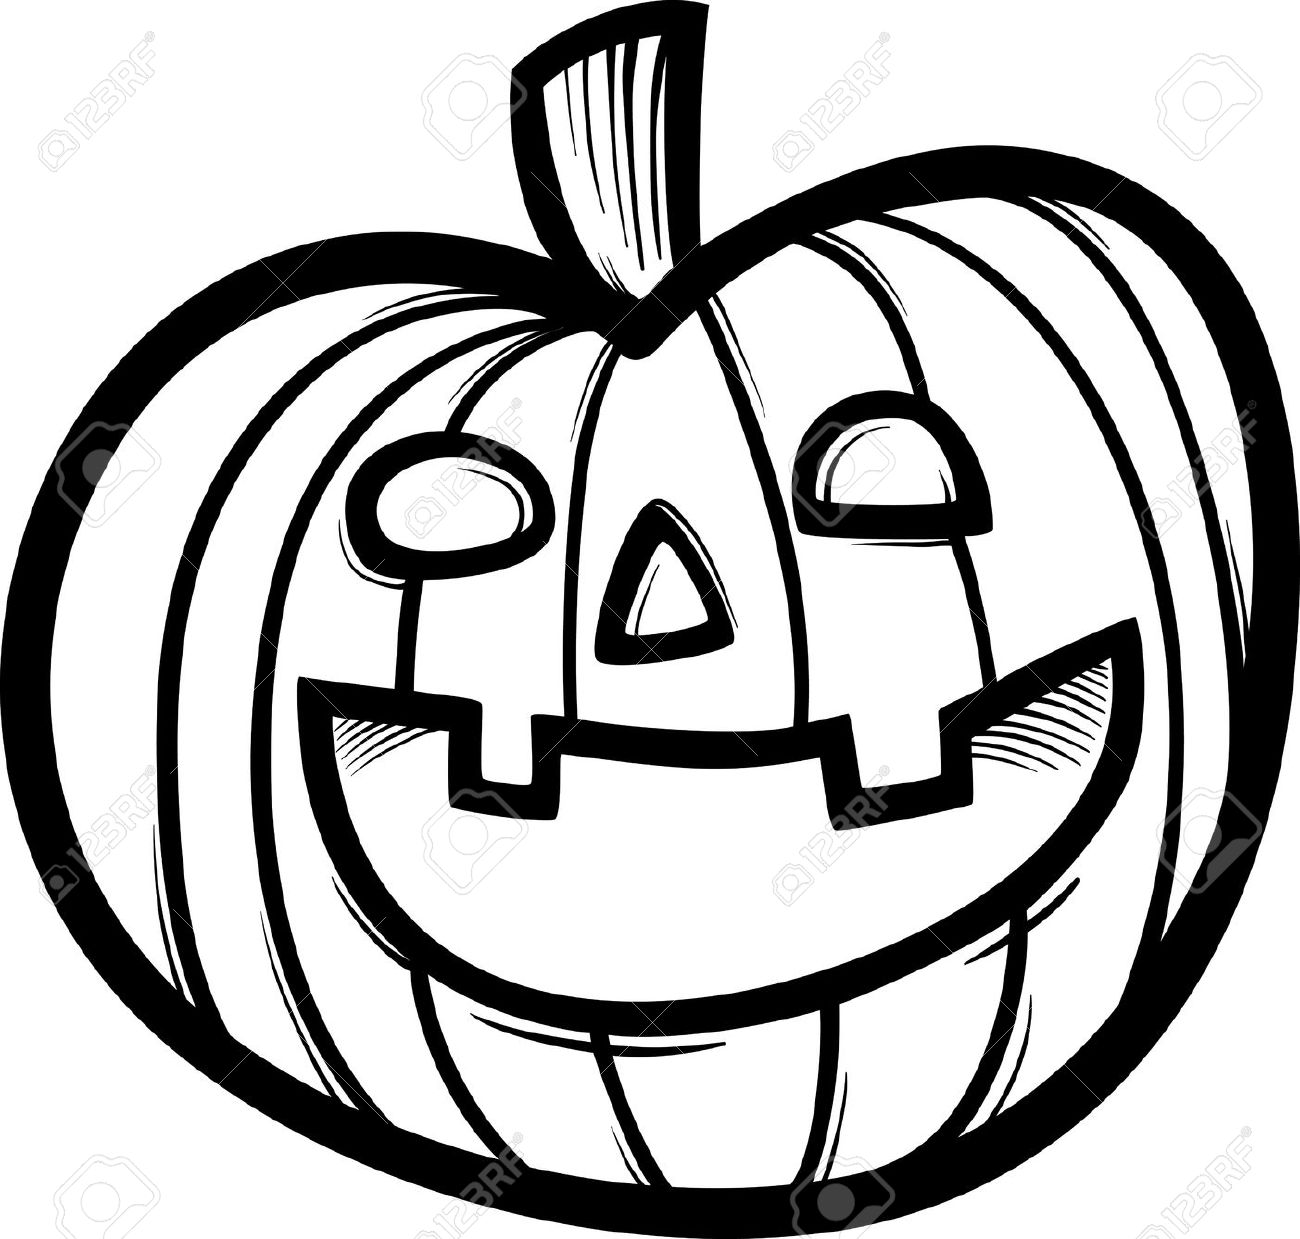 1300x1239 Pumpkin Black And White Black And White Halloween Pumpkin Clipart